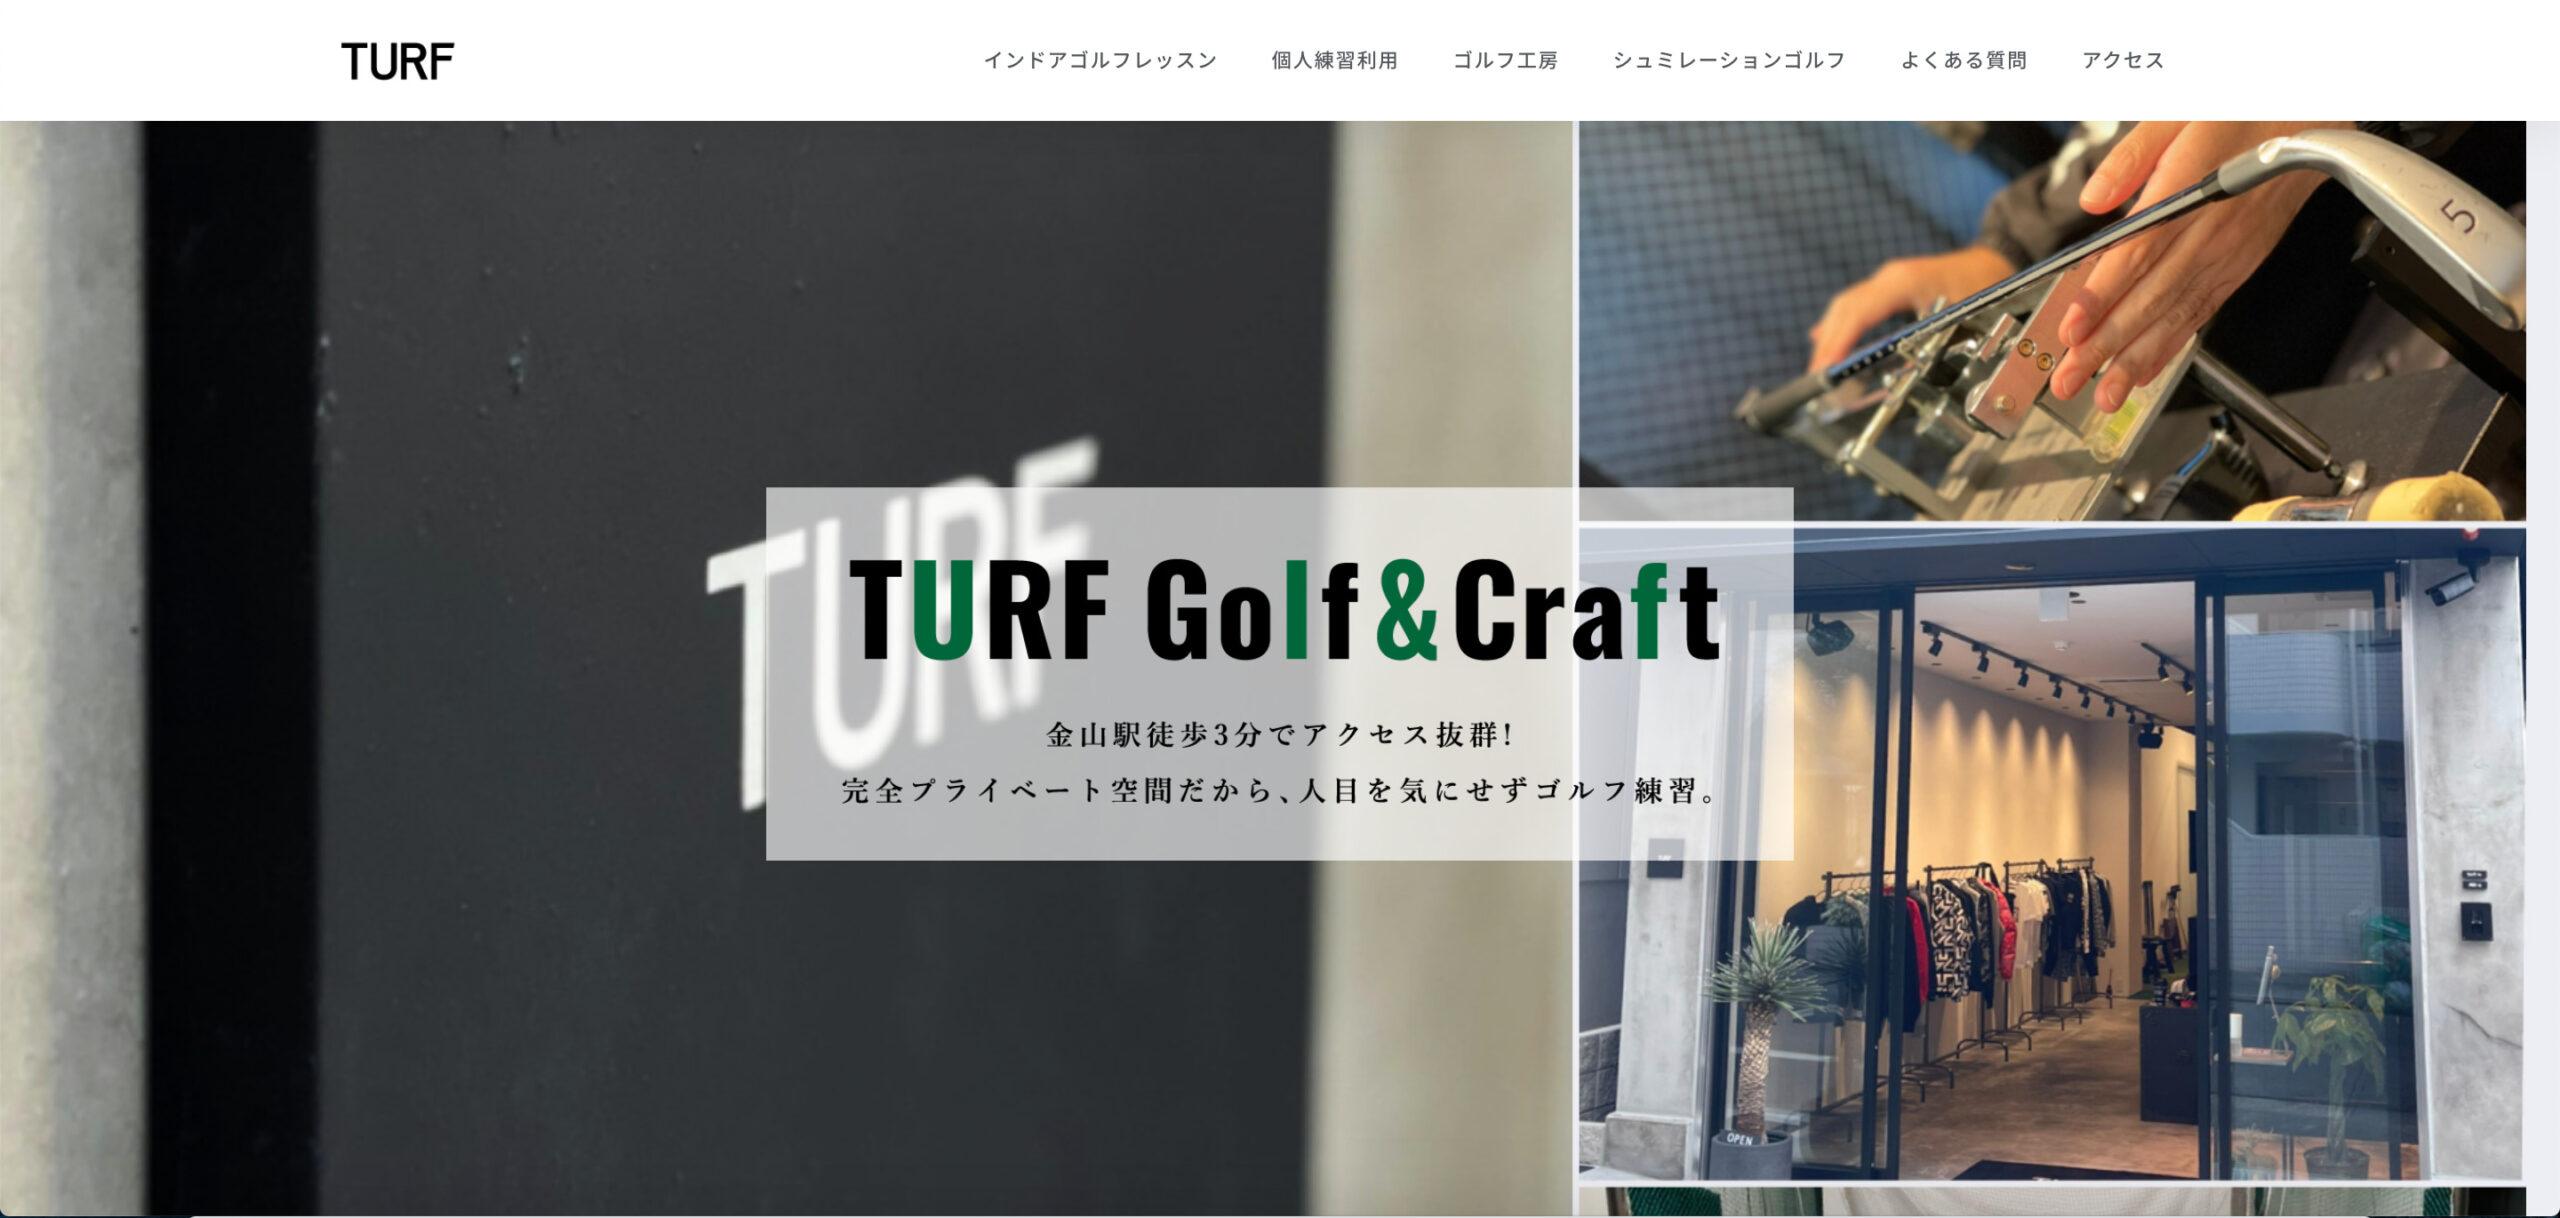 TURF GOLF